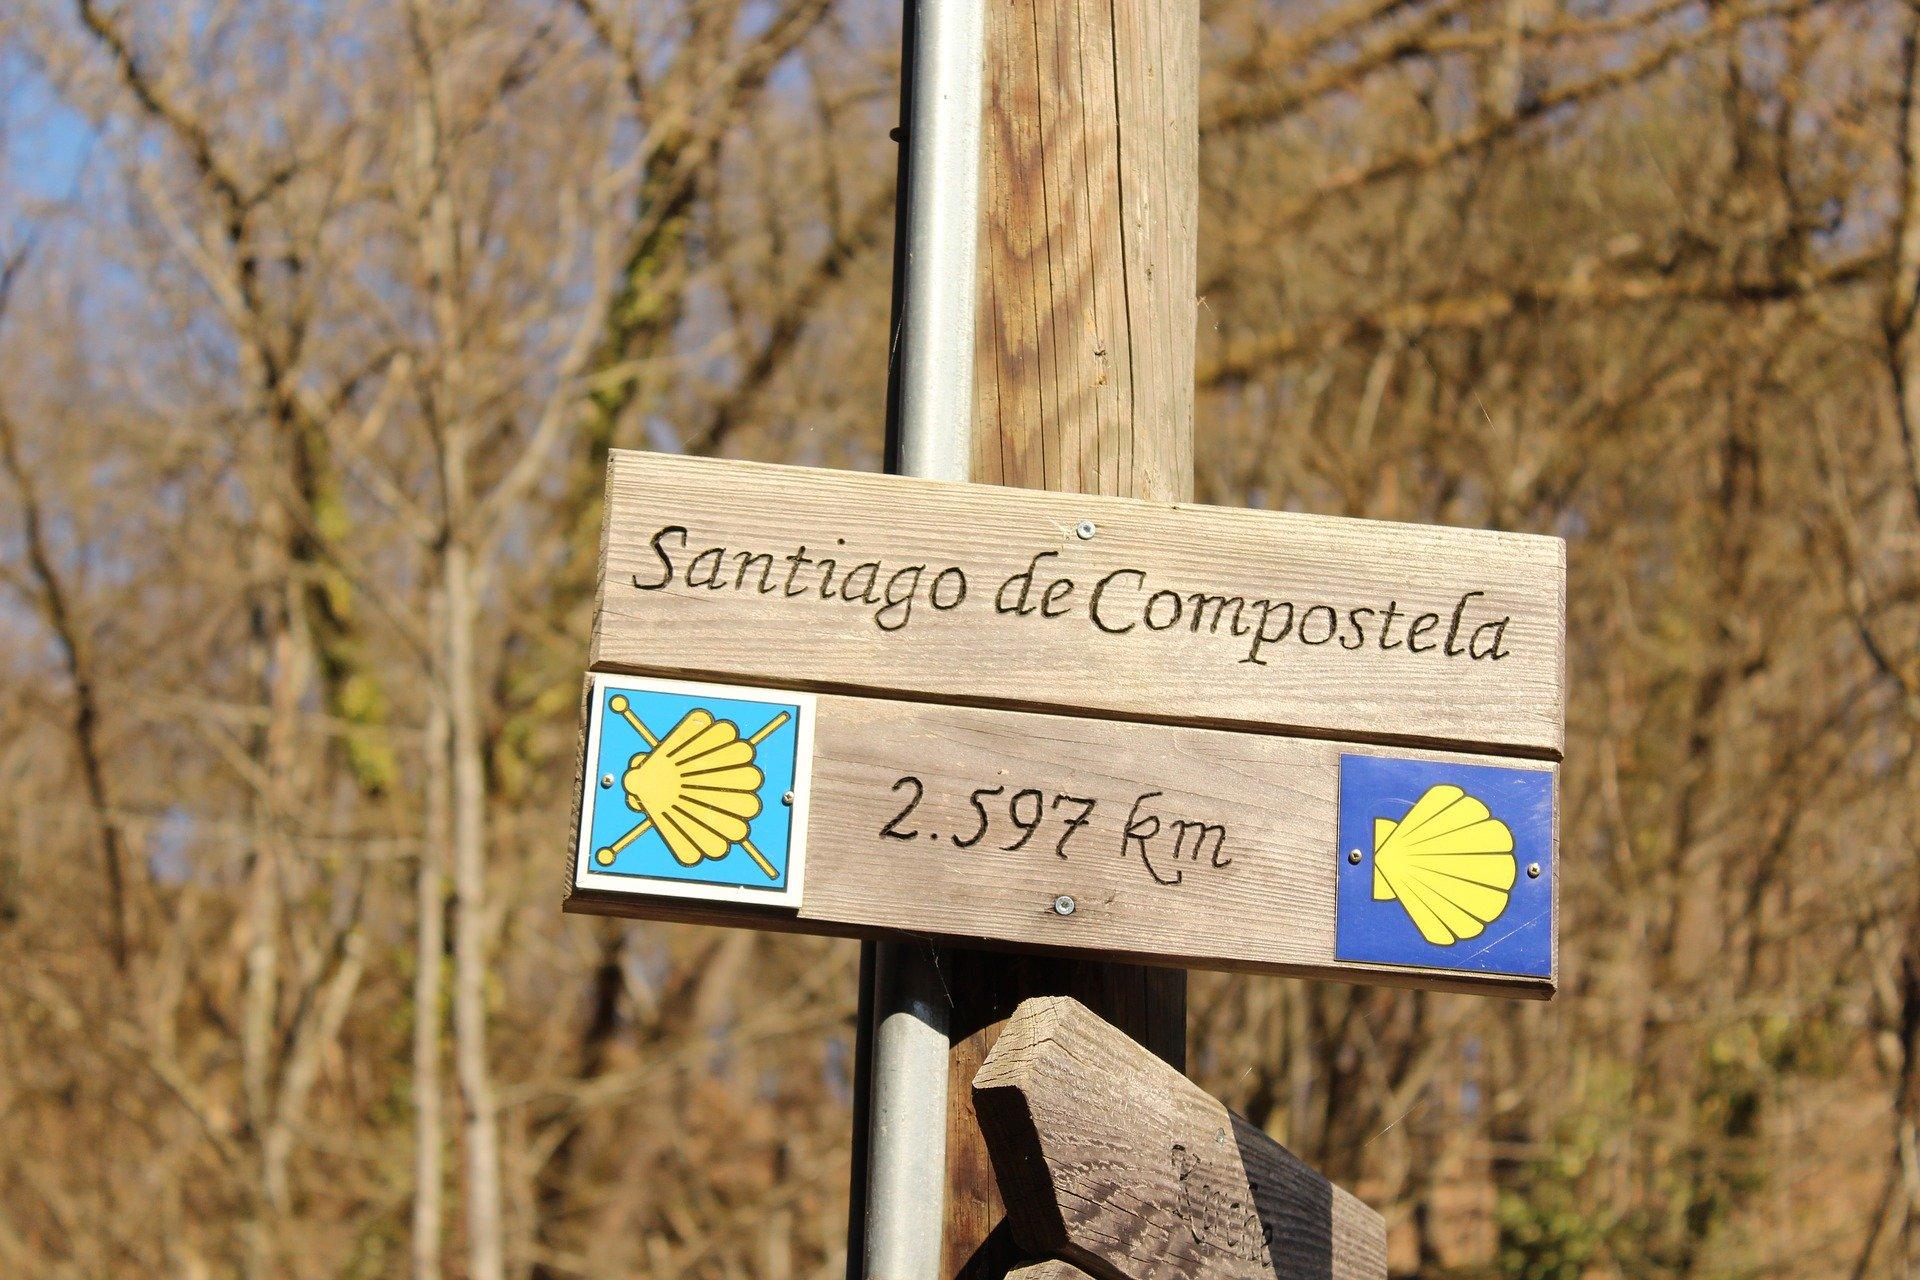 Cammino di Santiago de Compostela: s